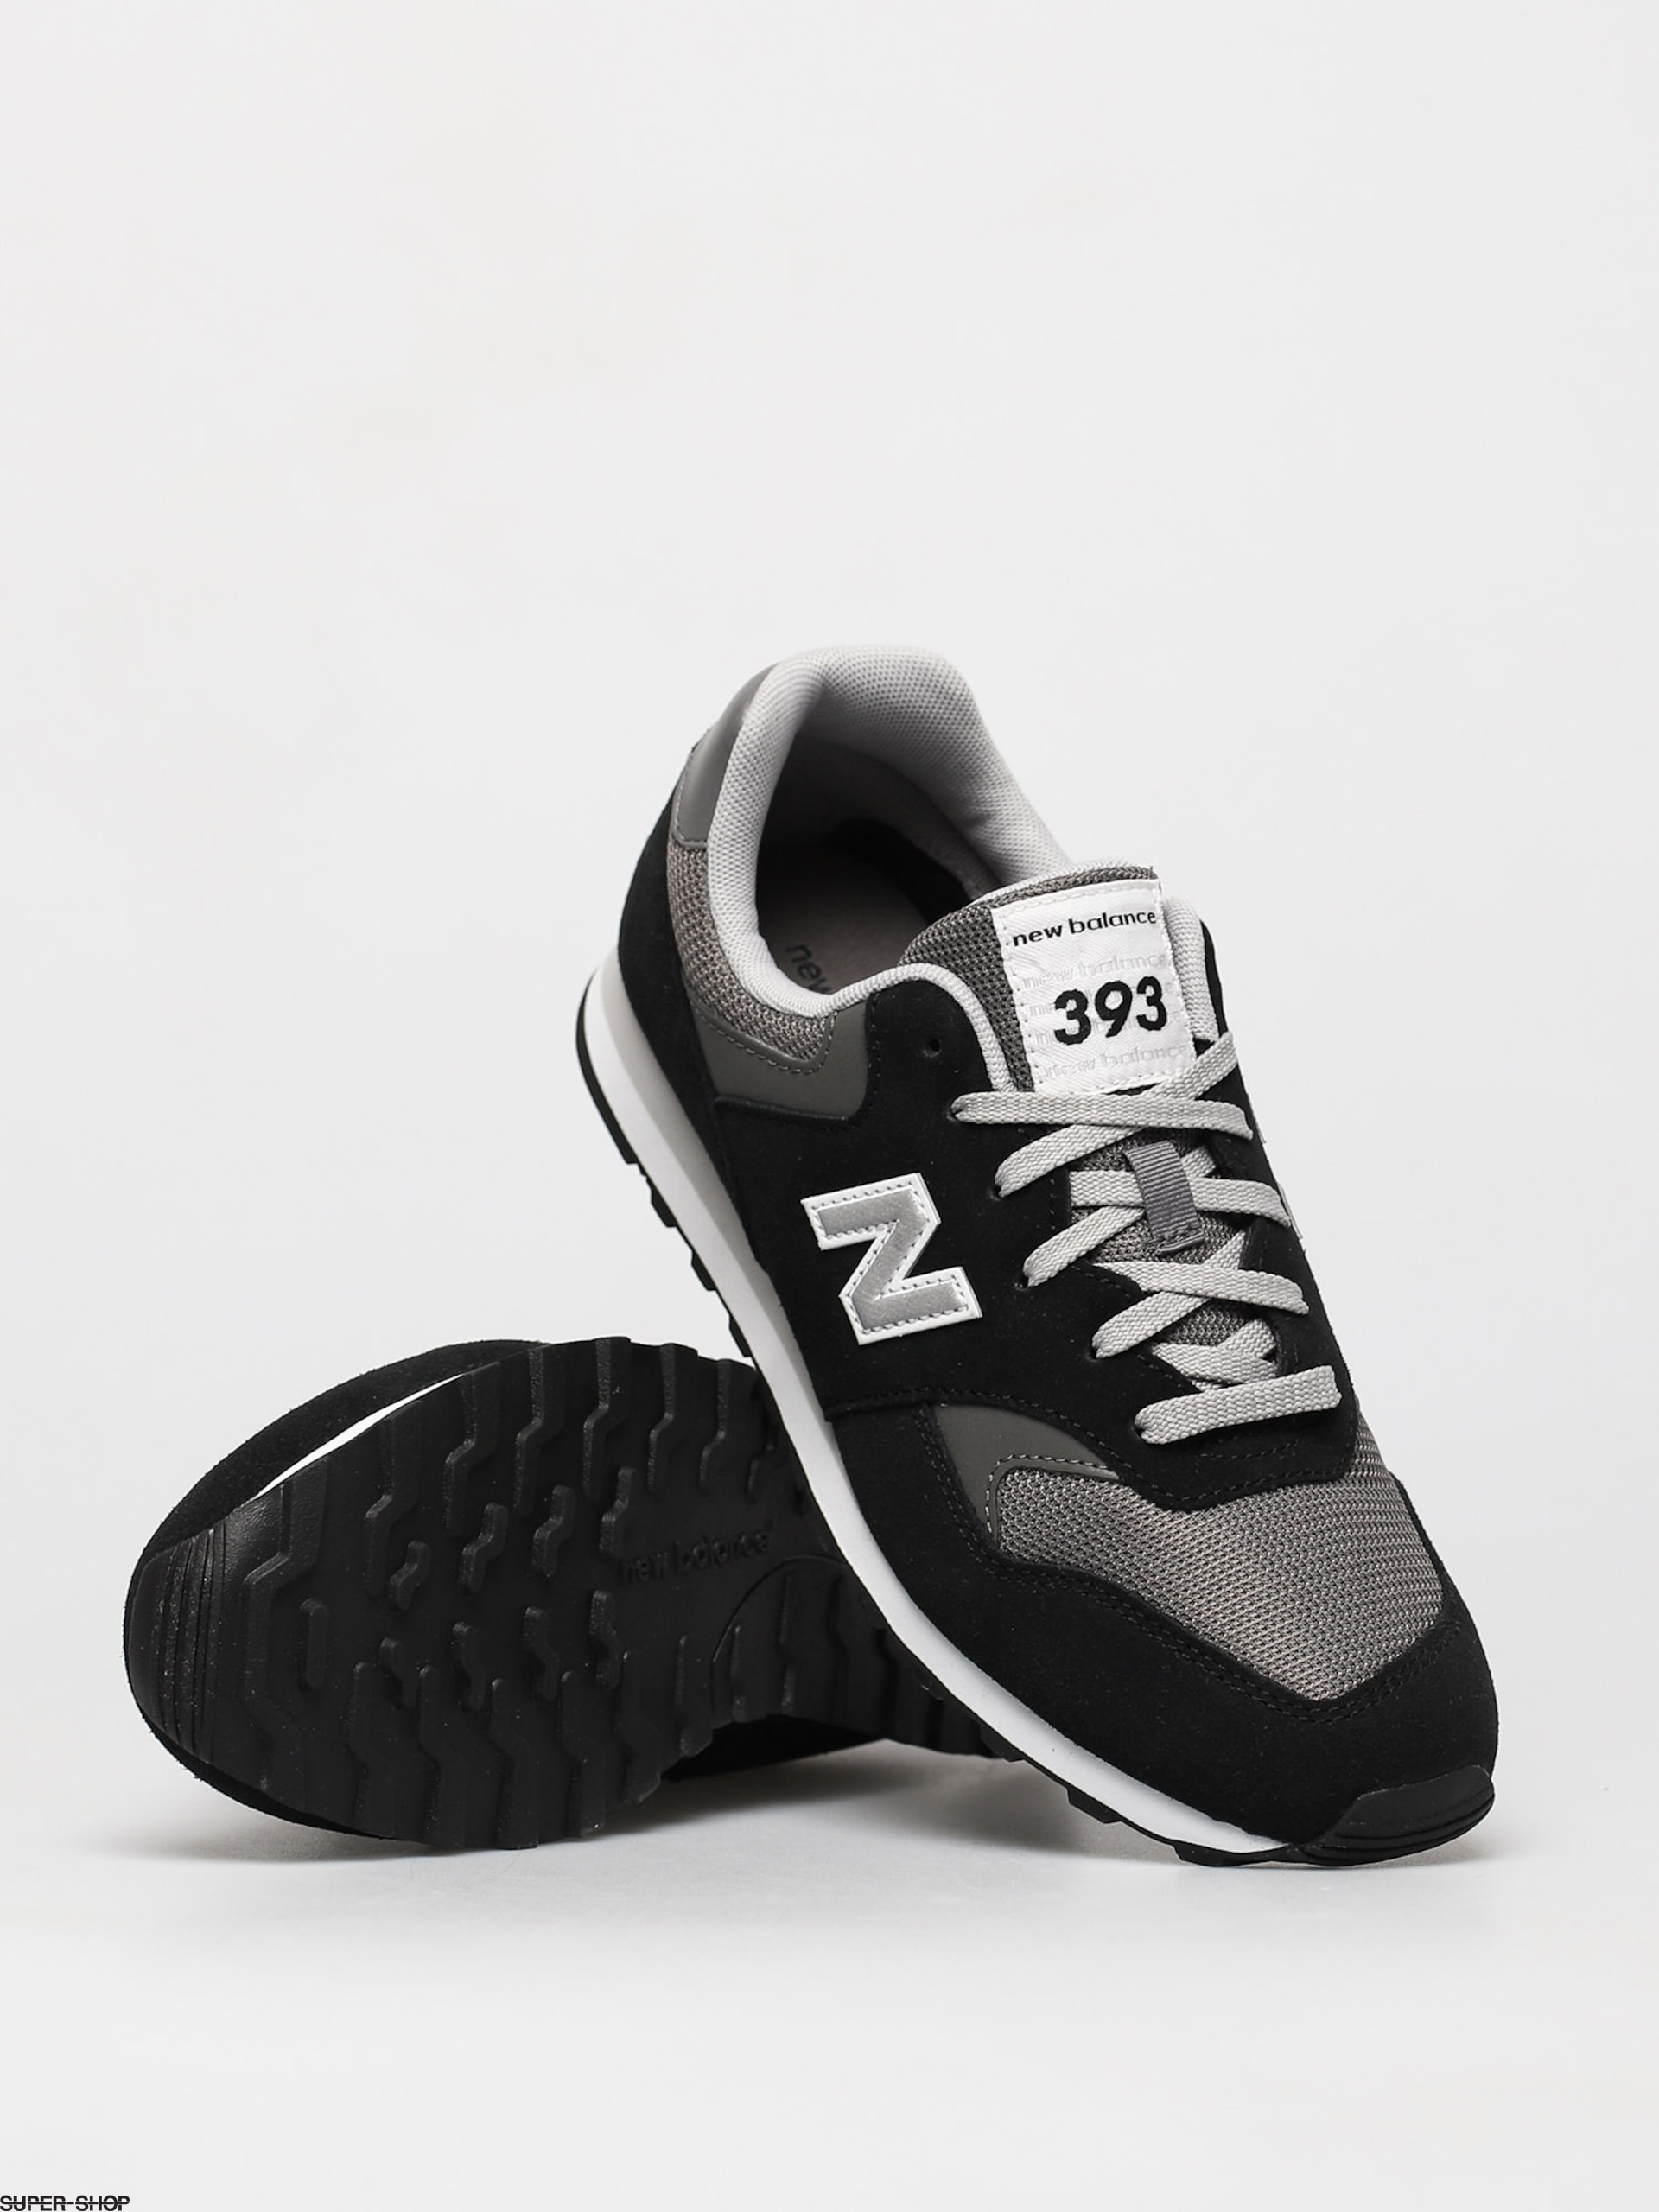 New Balance 393 Shoes (black)